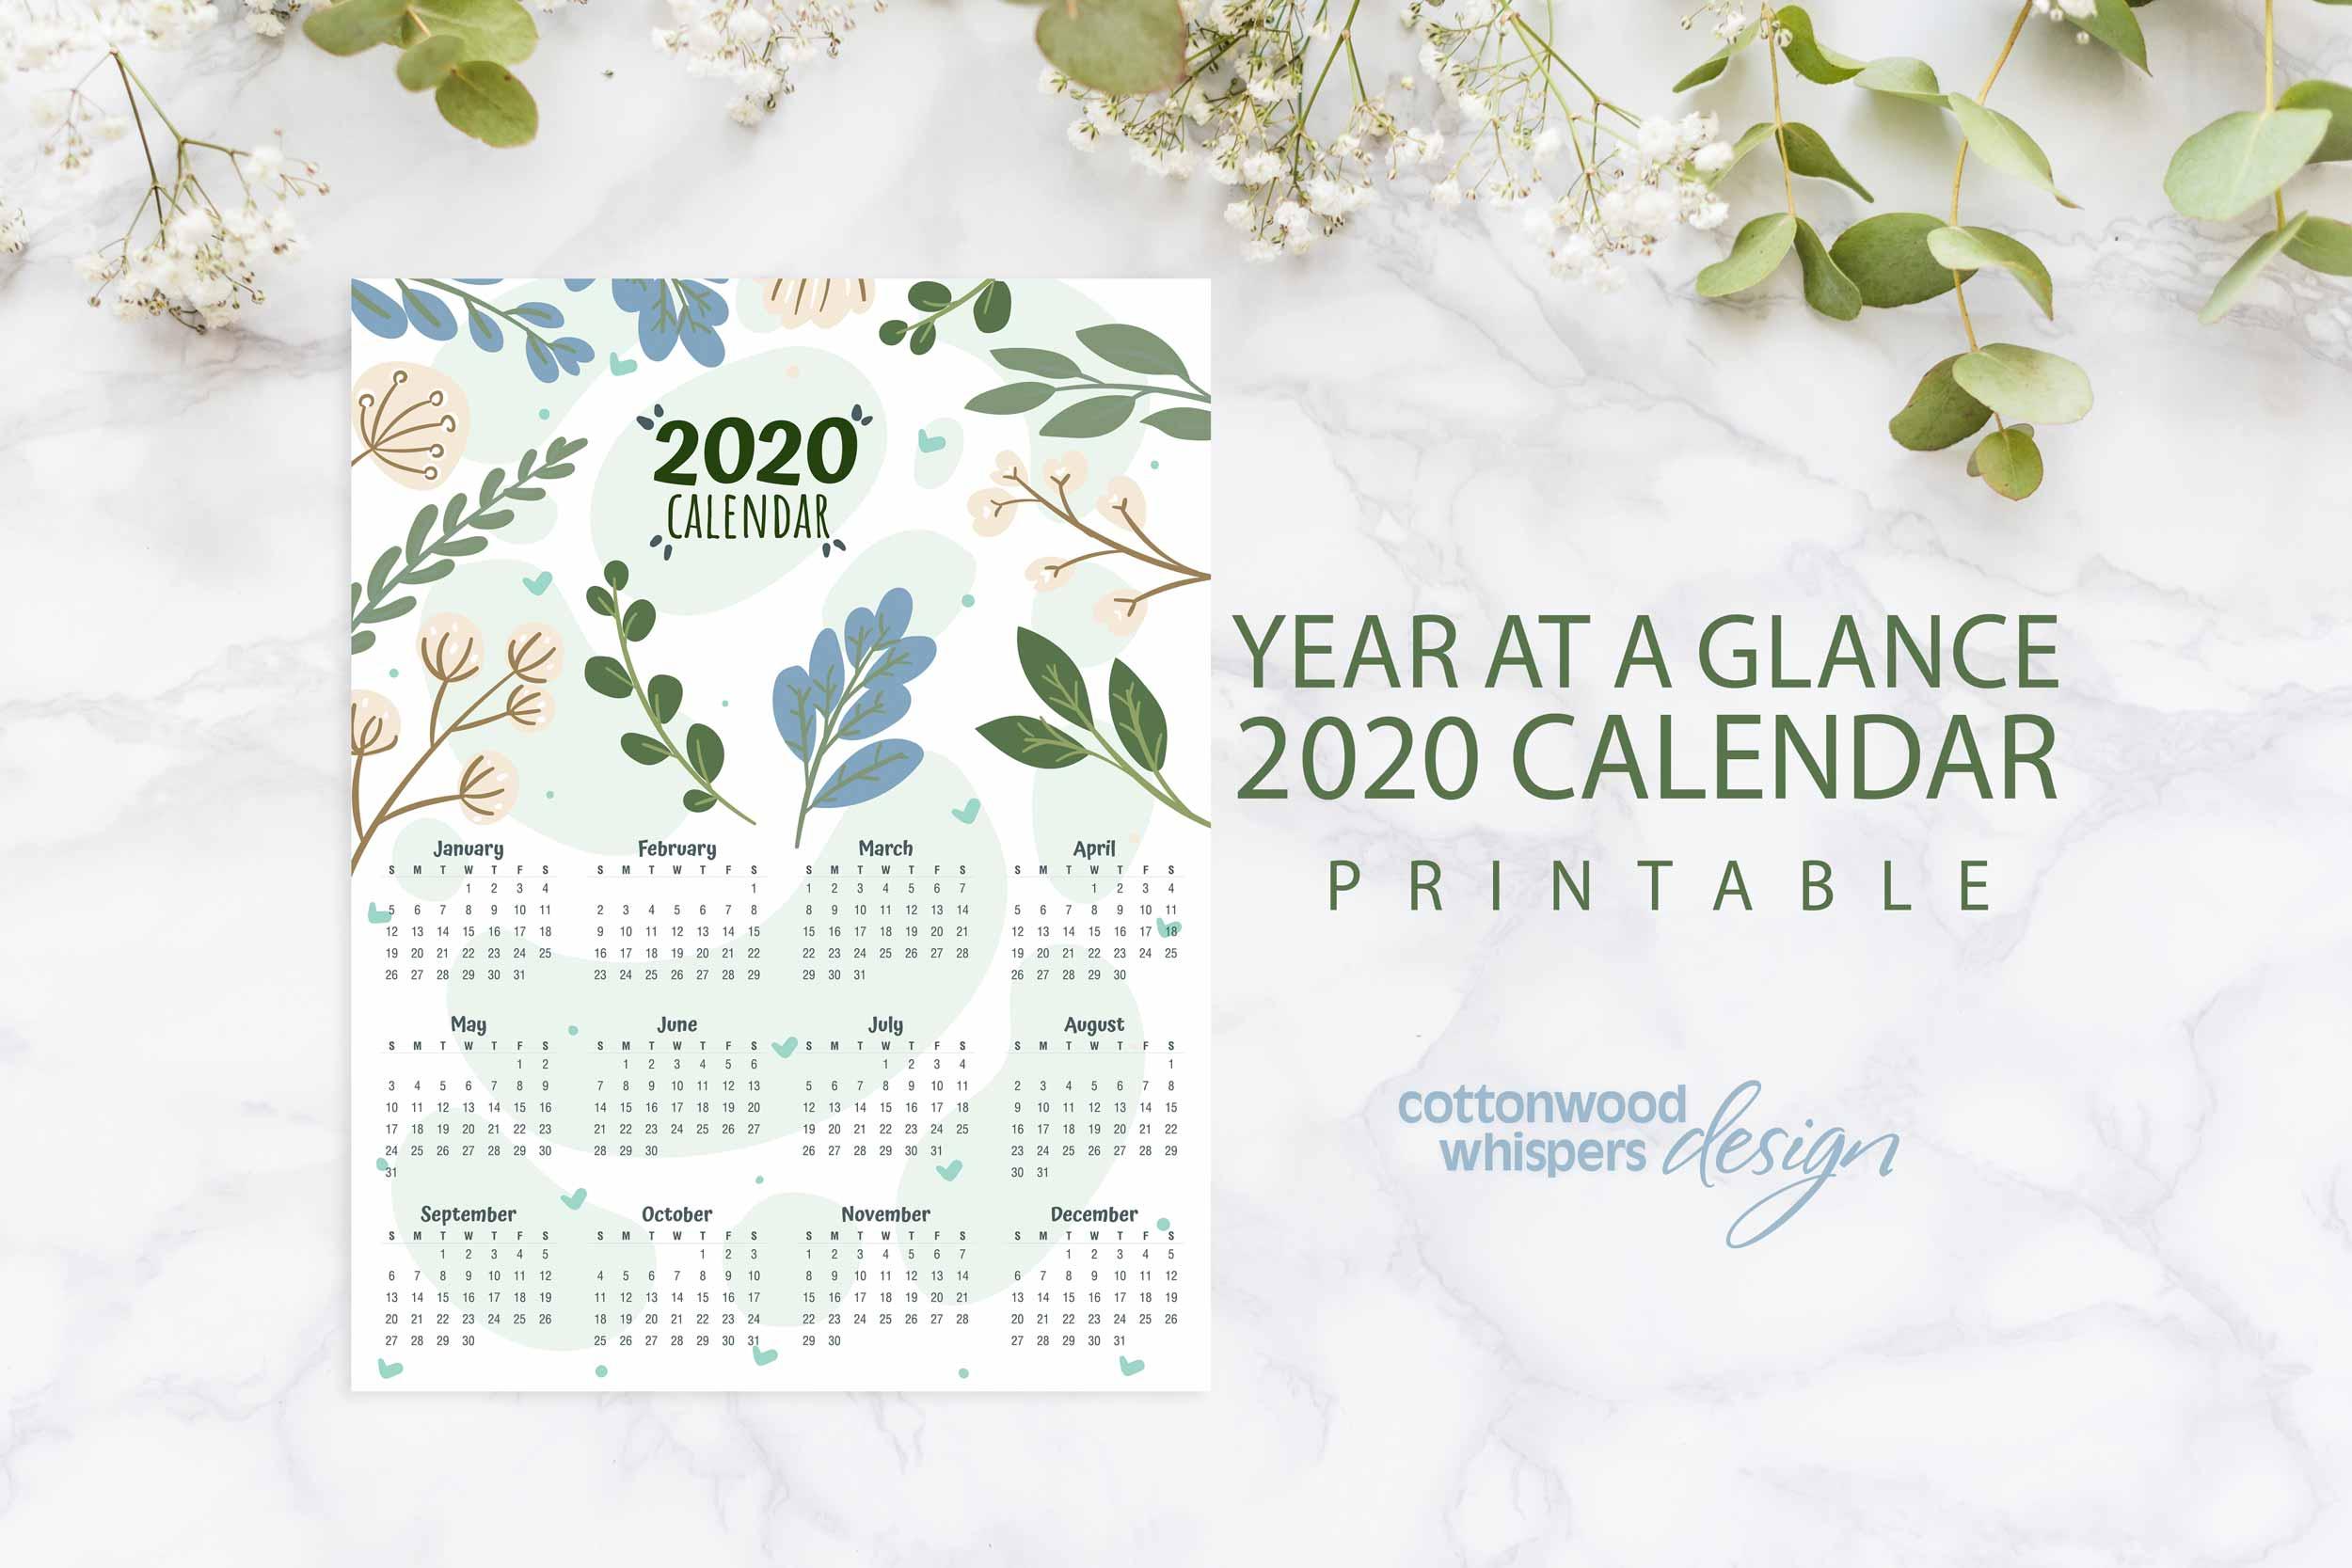 2020 Year At A Glance Calendar   Blue & Green in 2020 Calendar 8.5 X 11